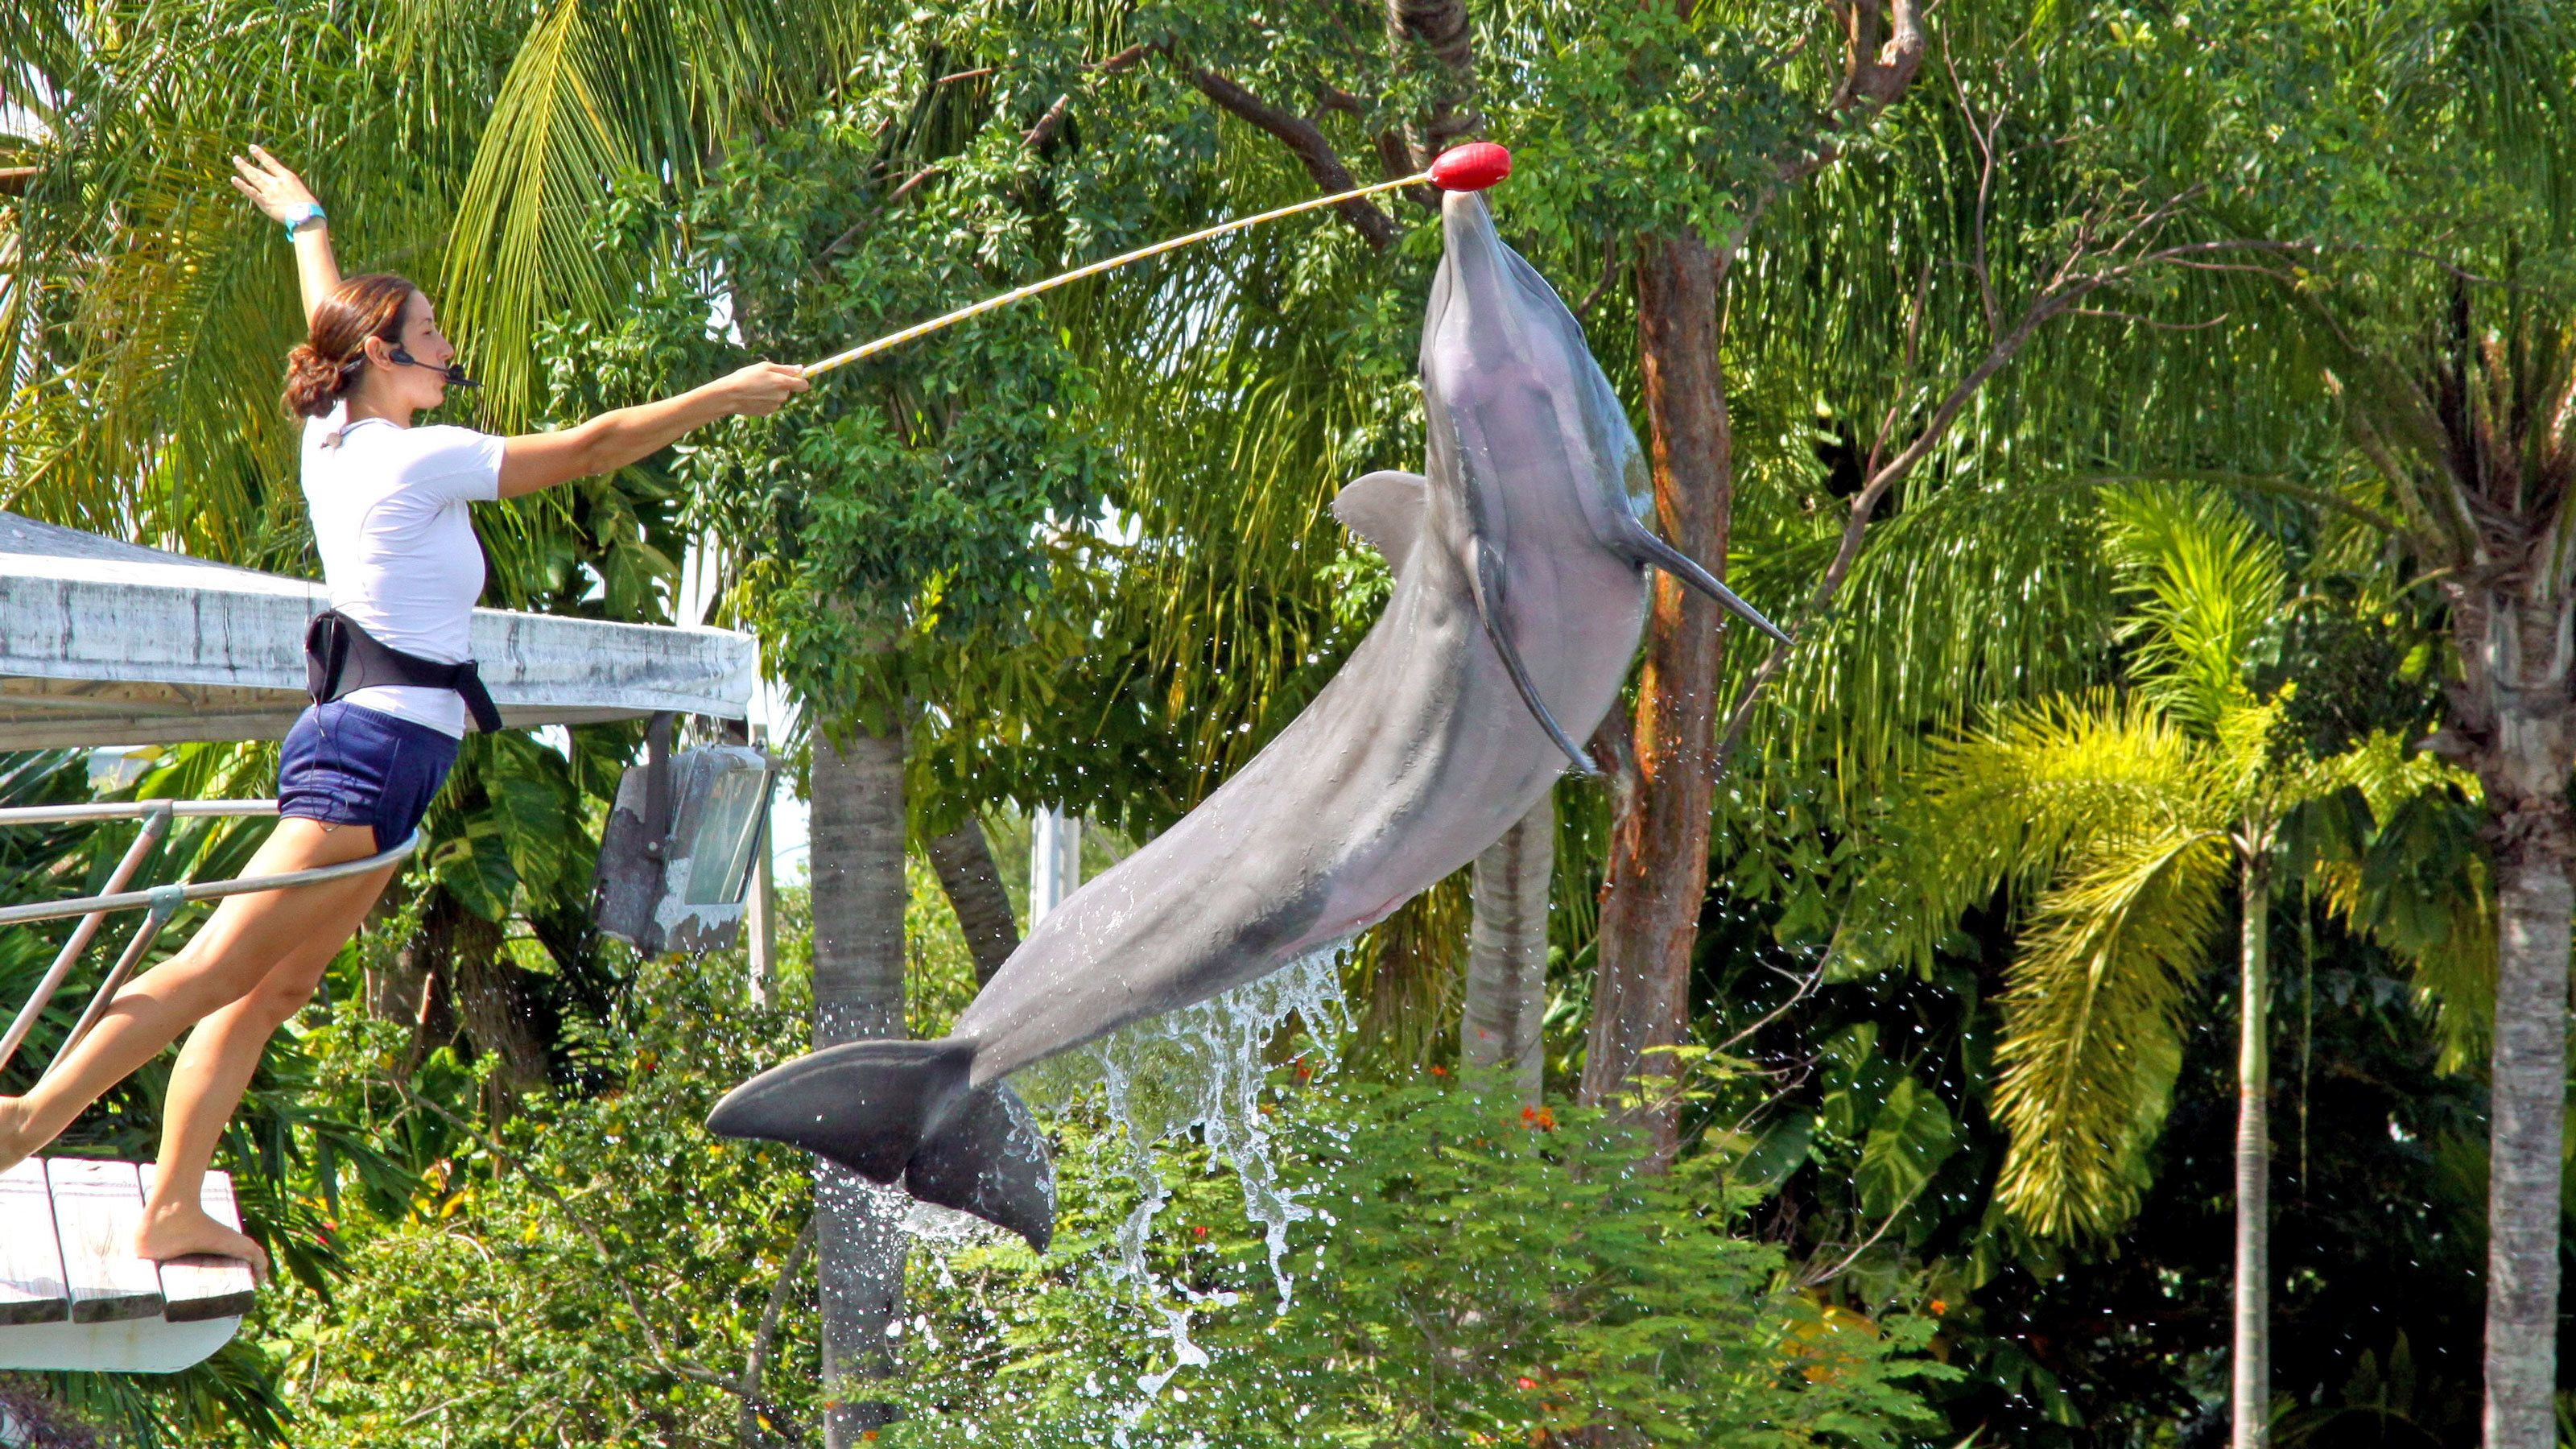 Dolphin at the Theater of the Sea in Islamorada, Florida